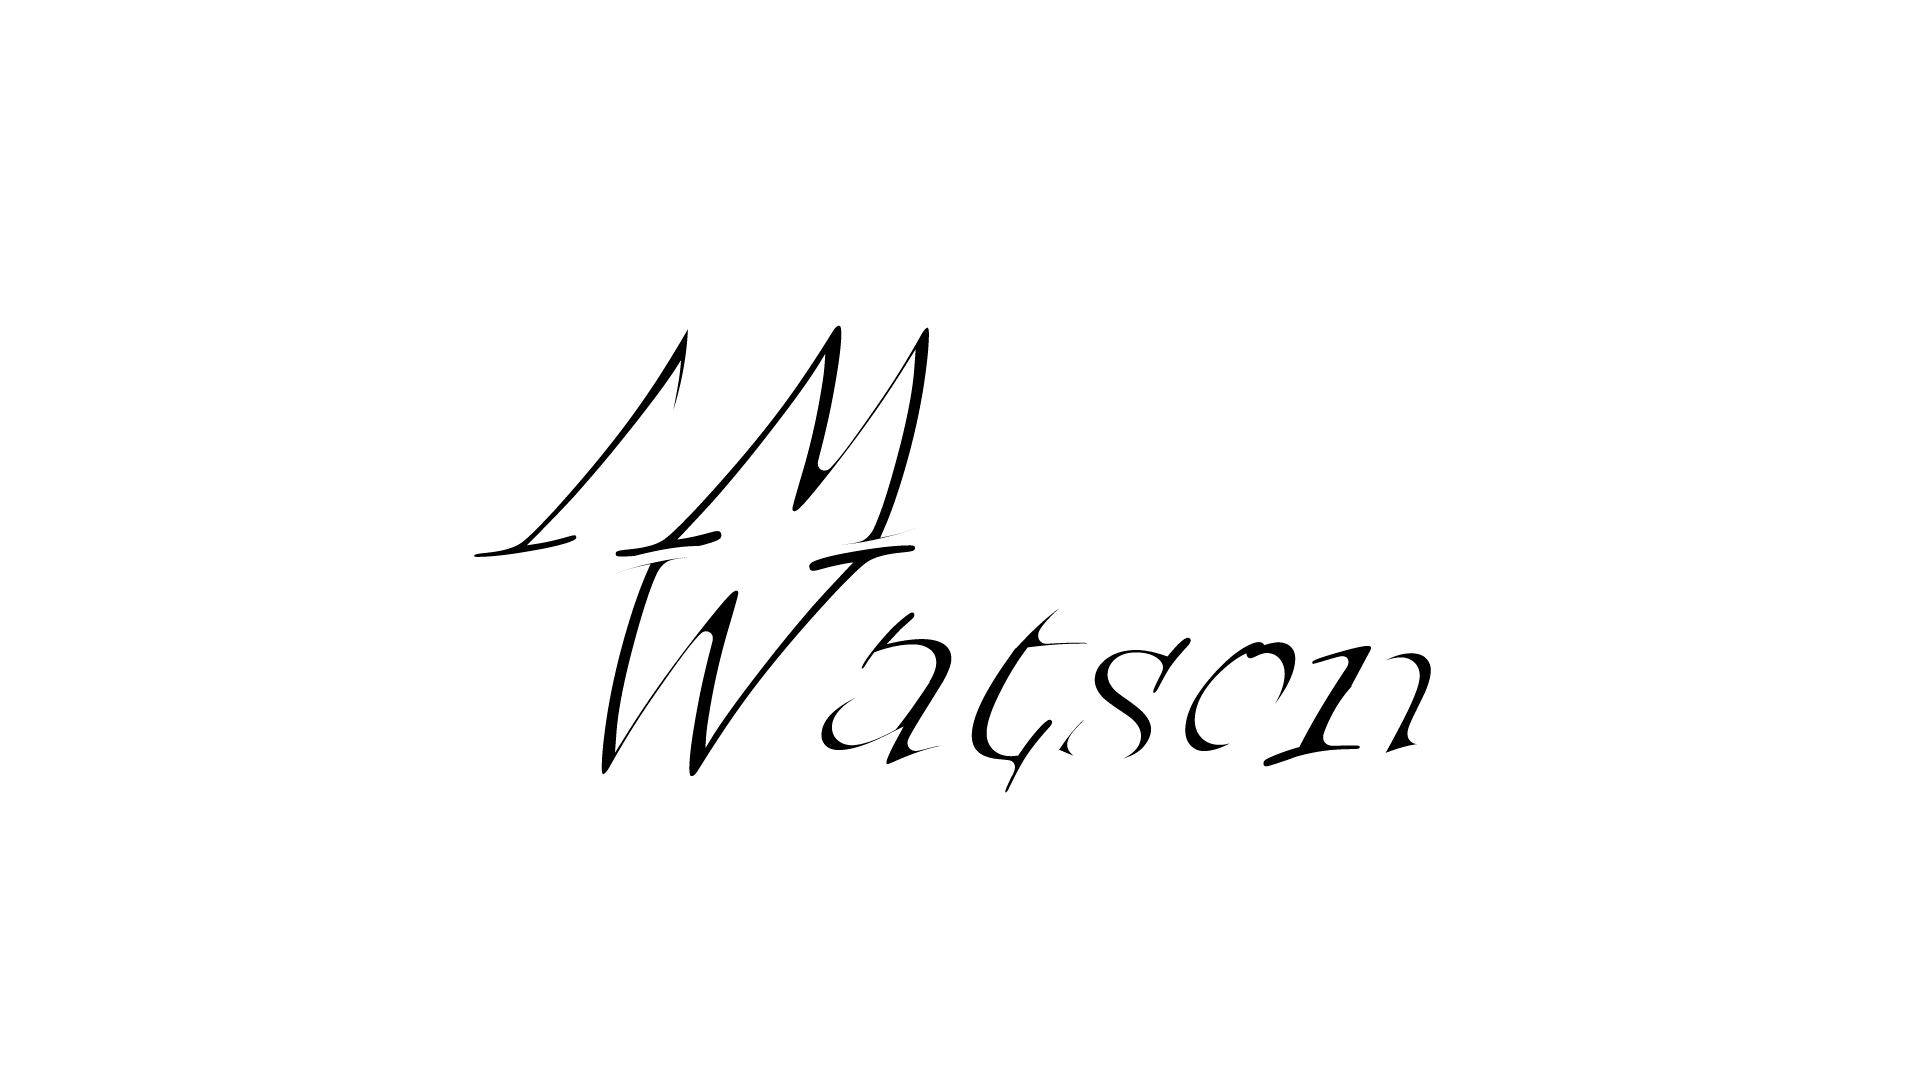 Разработать логотип для балетного бренда фото f_9655bc32064be505.png